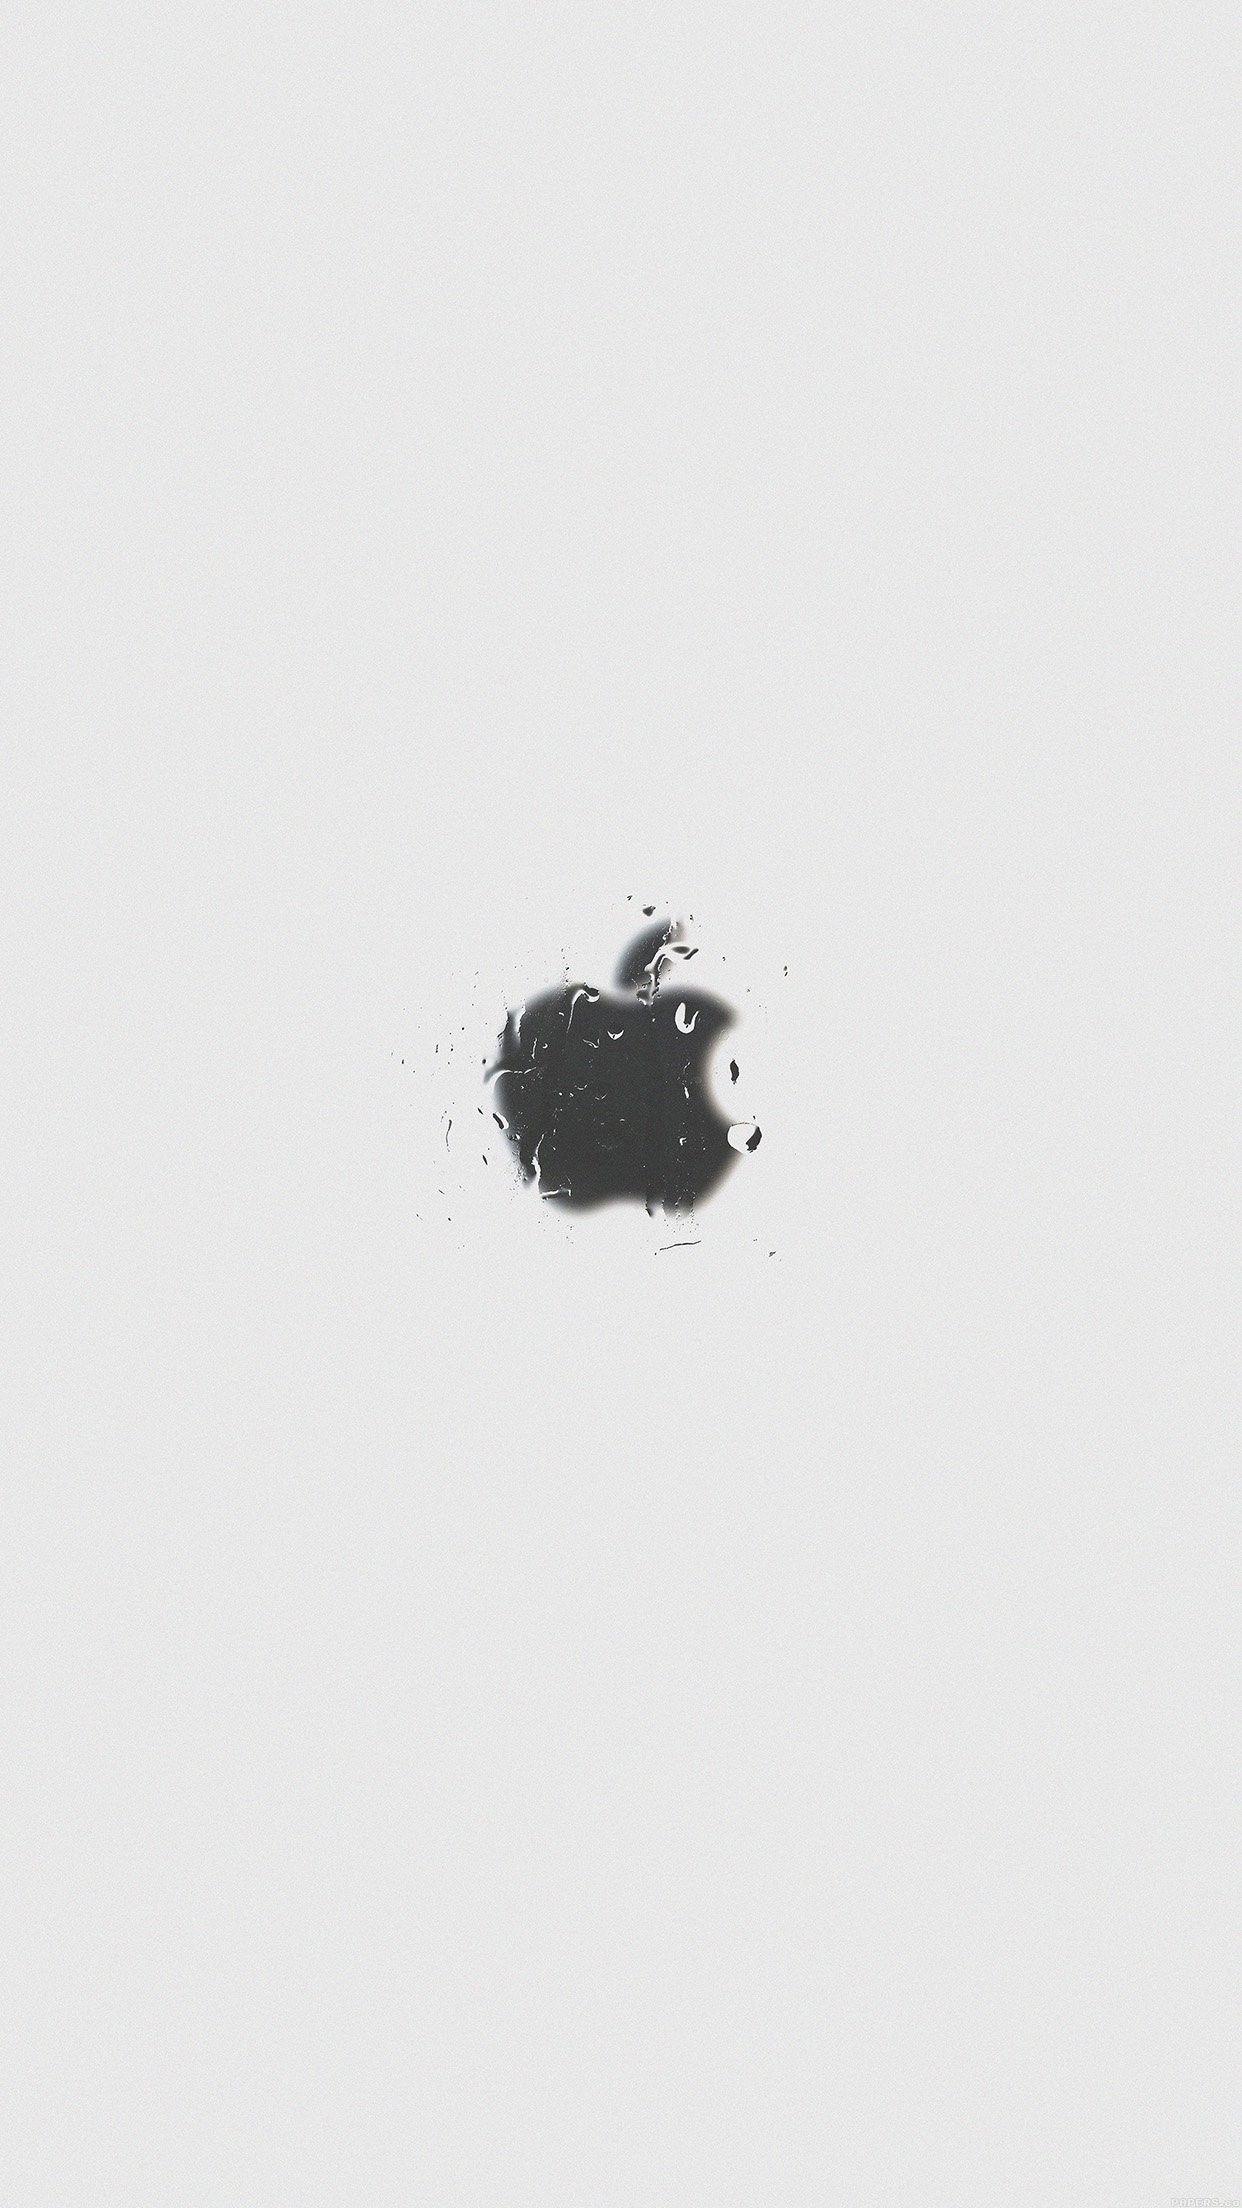 White Minimalist Wallpaper Android